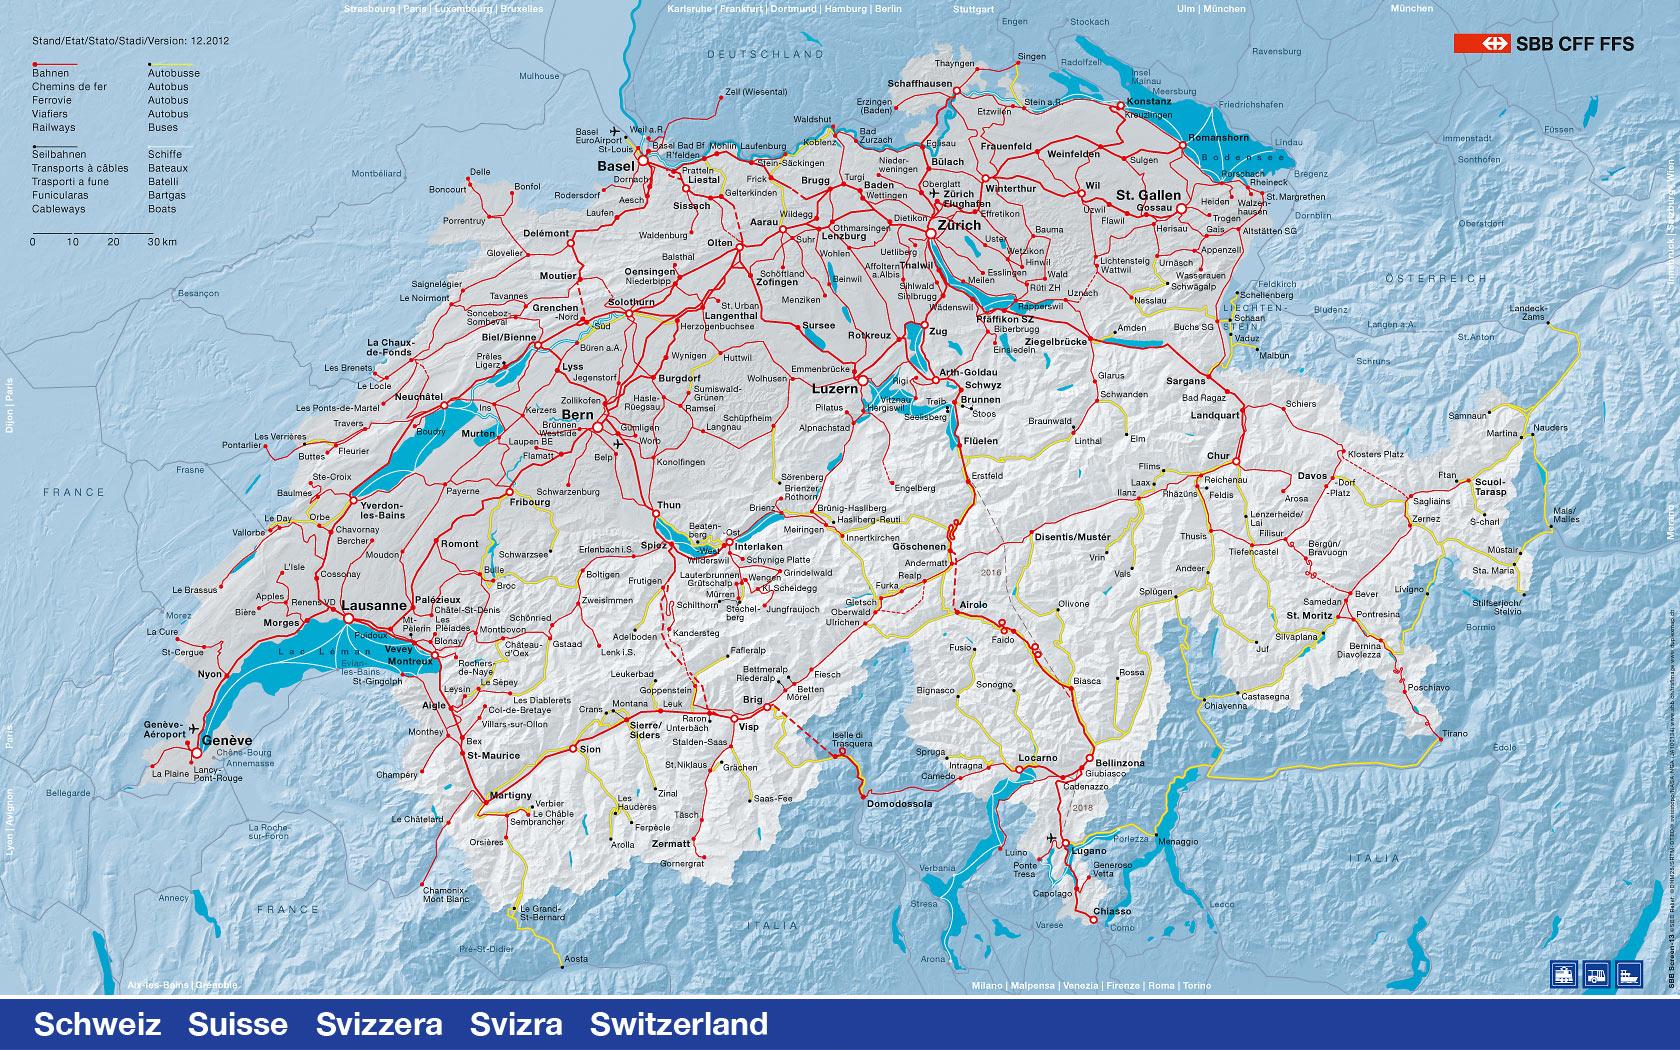 Карта Швейцарии - транспортные карты Швейцарии - Путеводитель